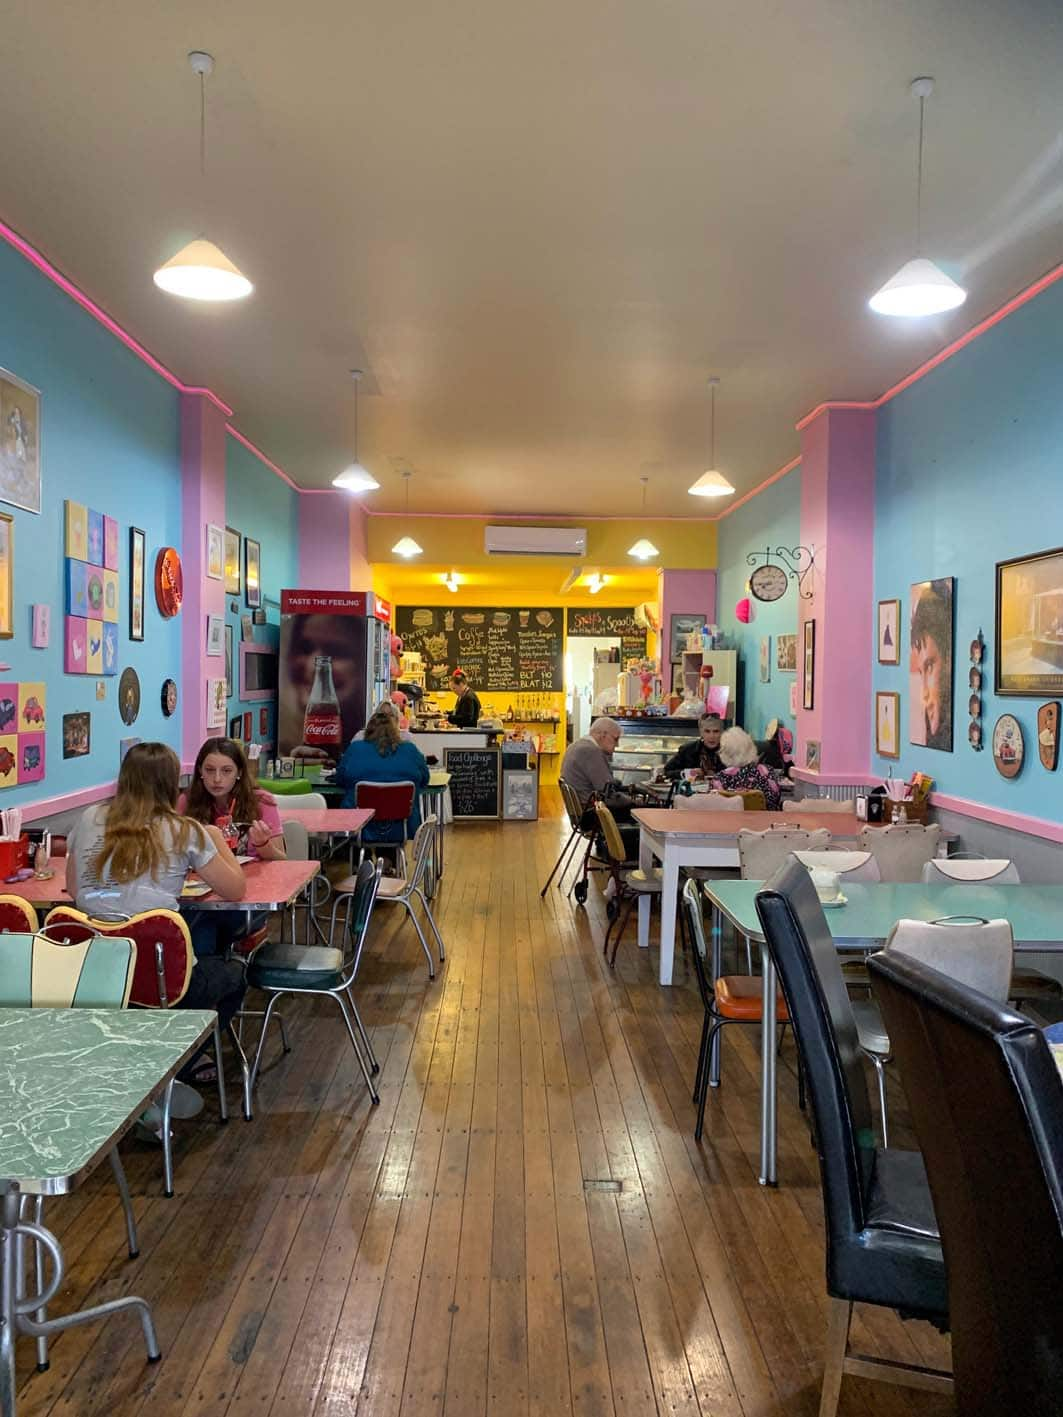 The Retro Diner